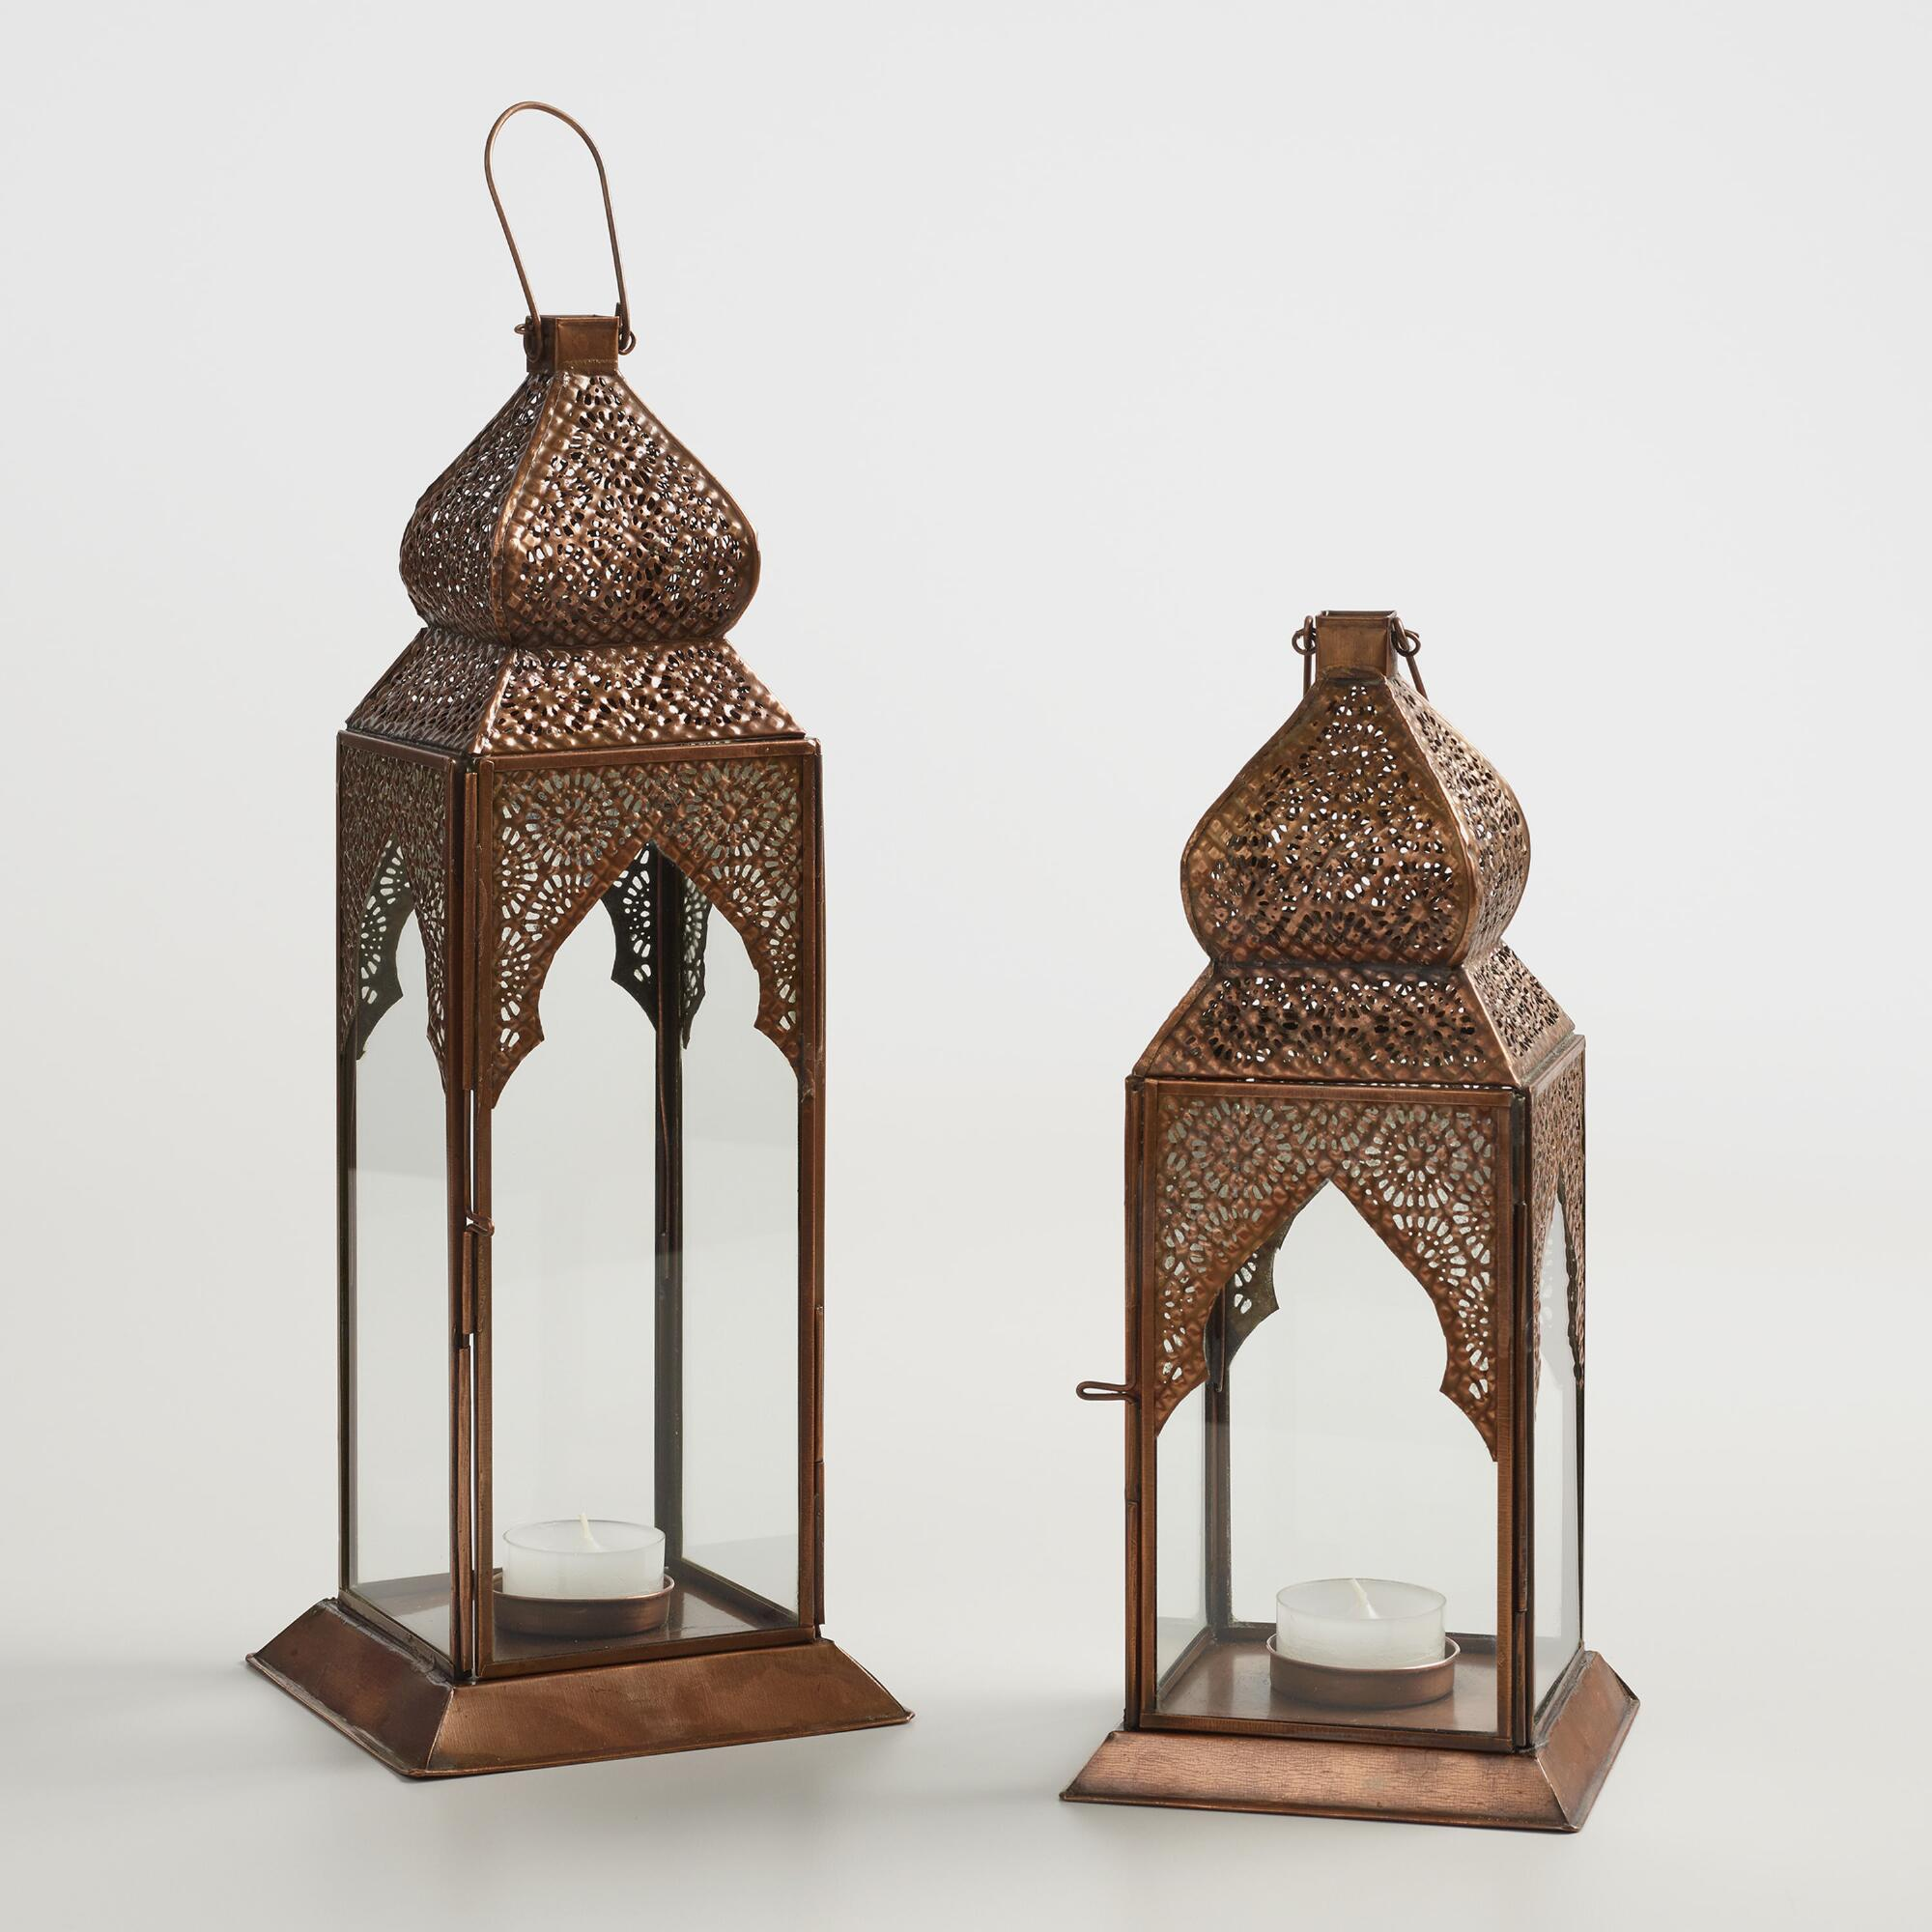 Antique Copper Layla Tabletop Lantern